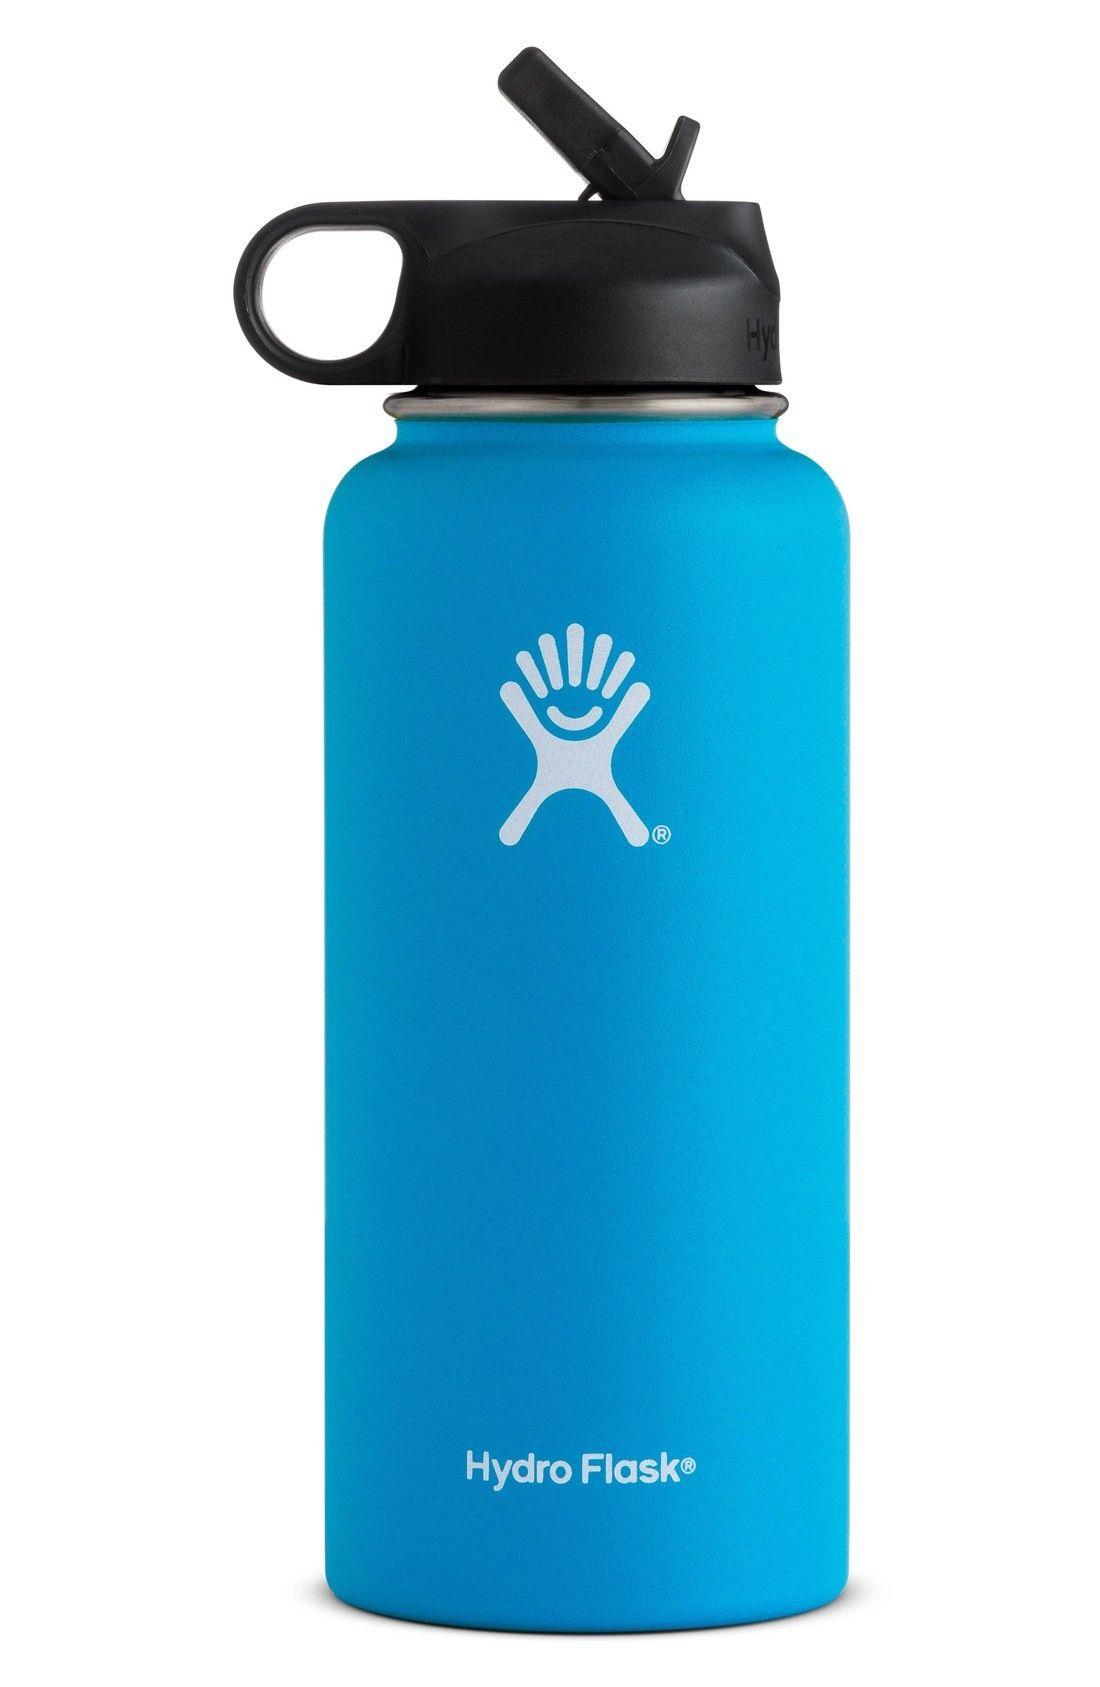 Hydro Flask Reusable Water Bottle